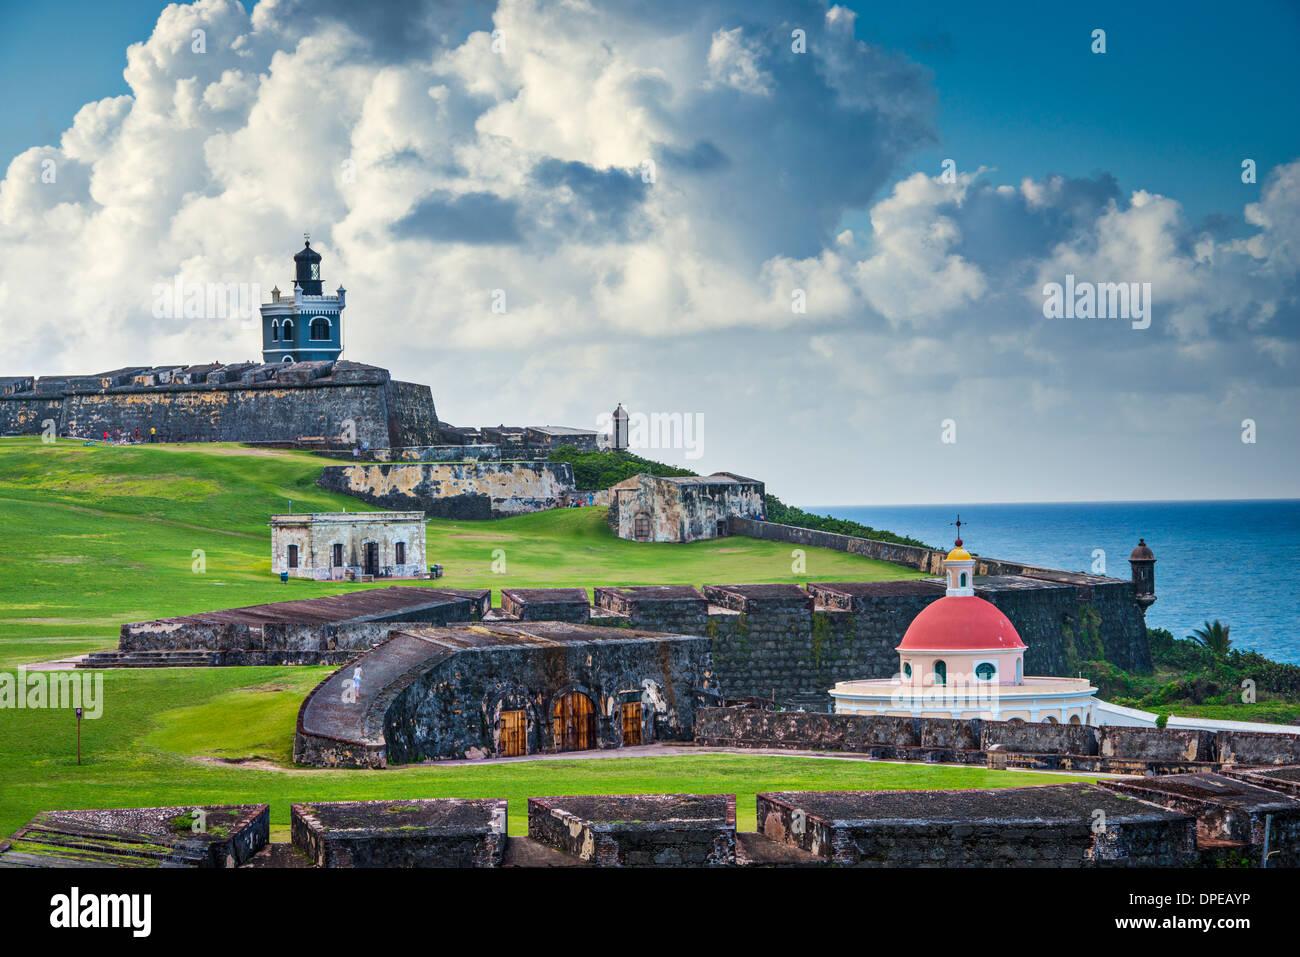 San Juan, Puerto Rico historischen Fort San Felipe Del Morro. Stockbild